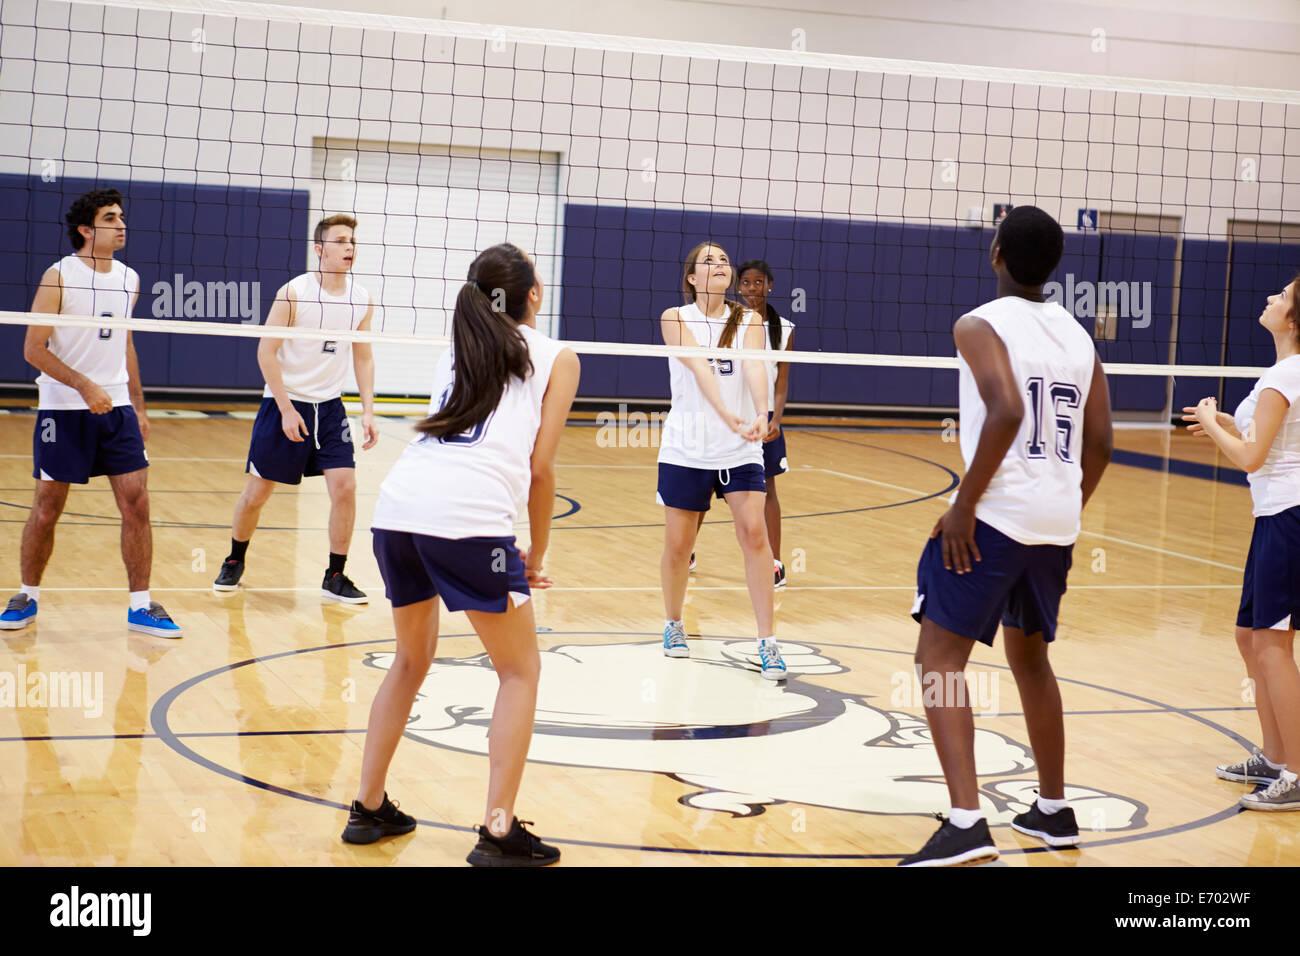 High School Volleyball Match im Gymnasium Stockbild